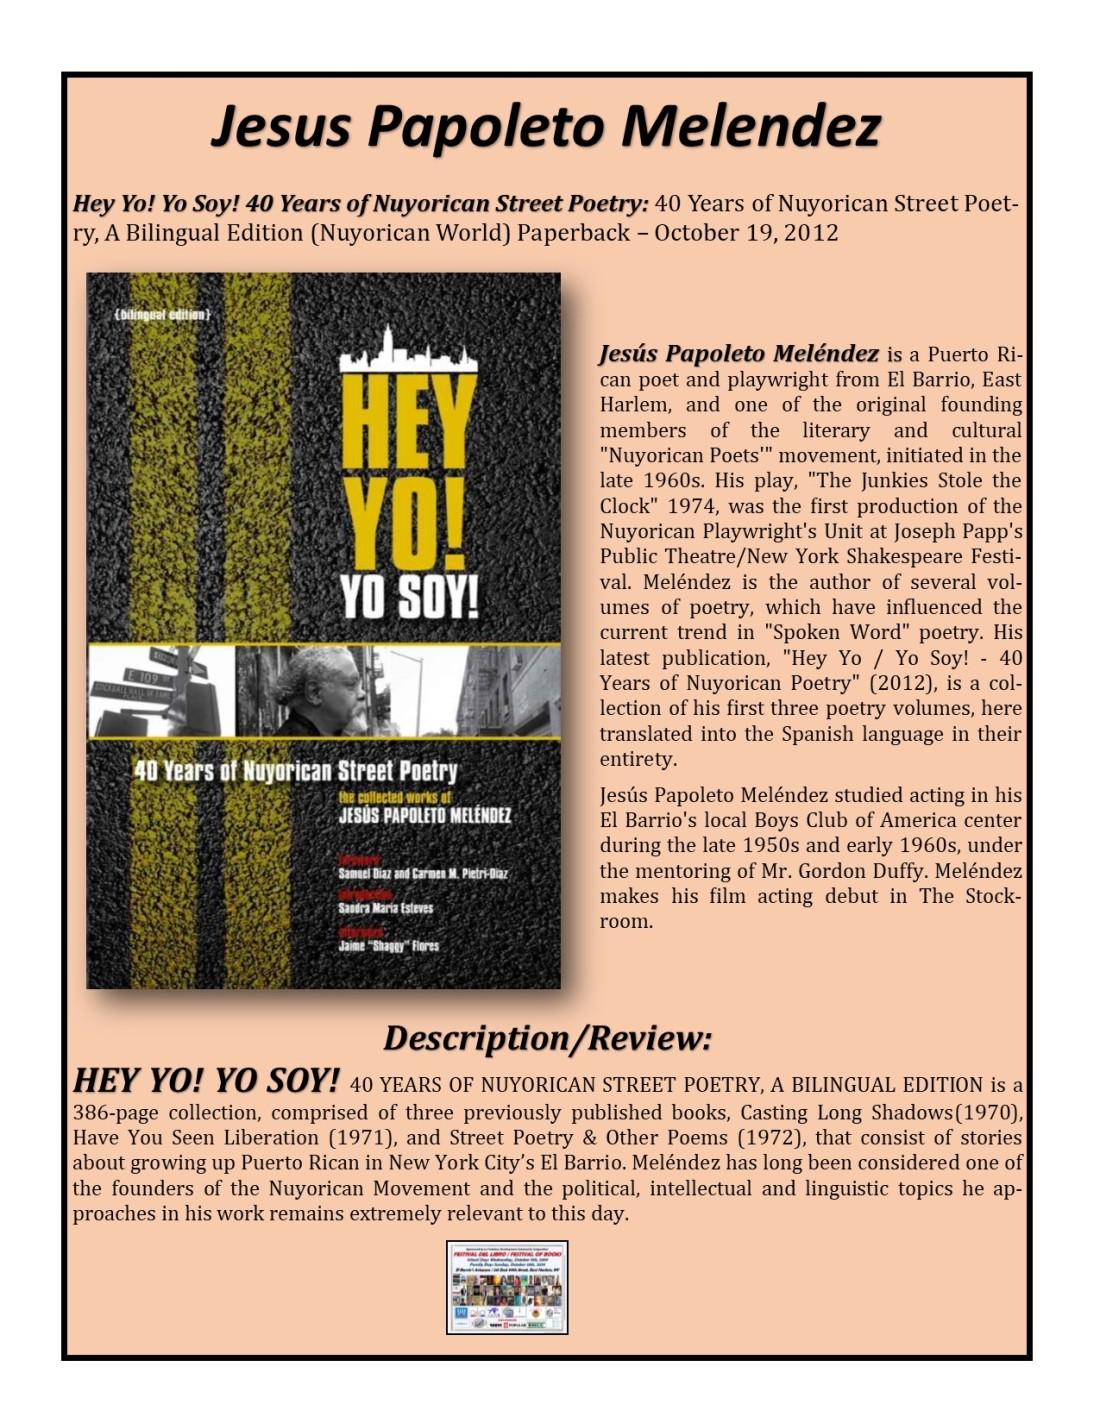 Book by Jesus Papoleto Melendez 1jpeg